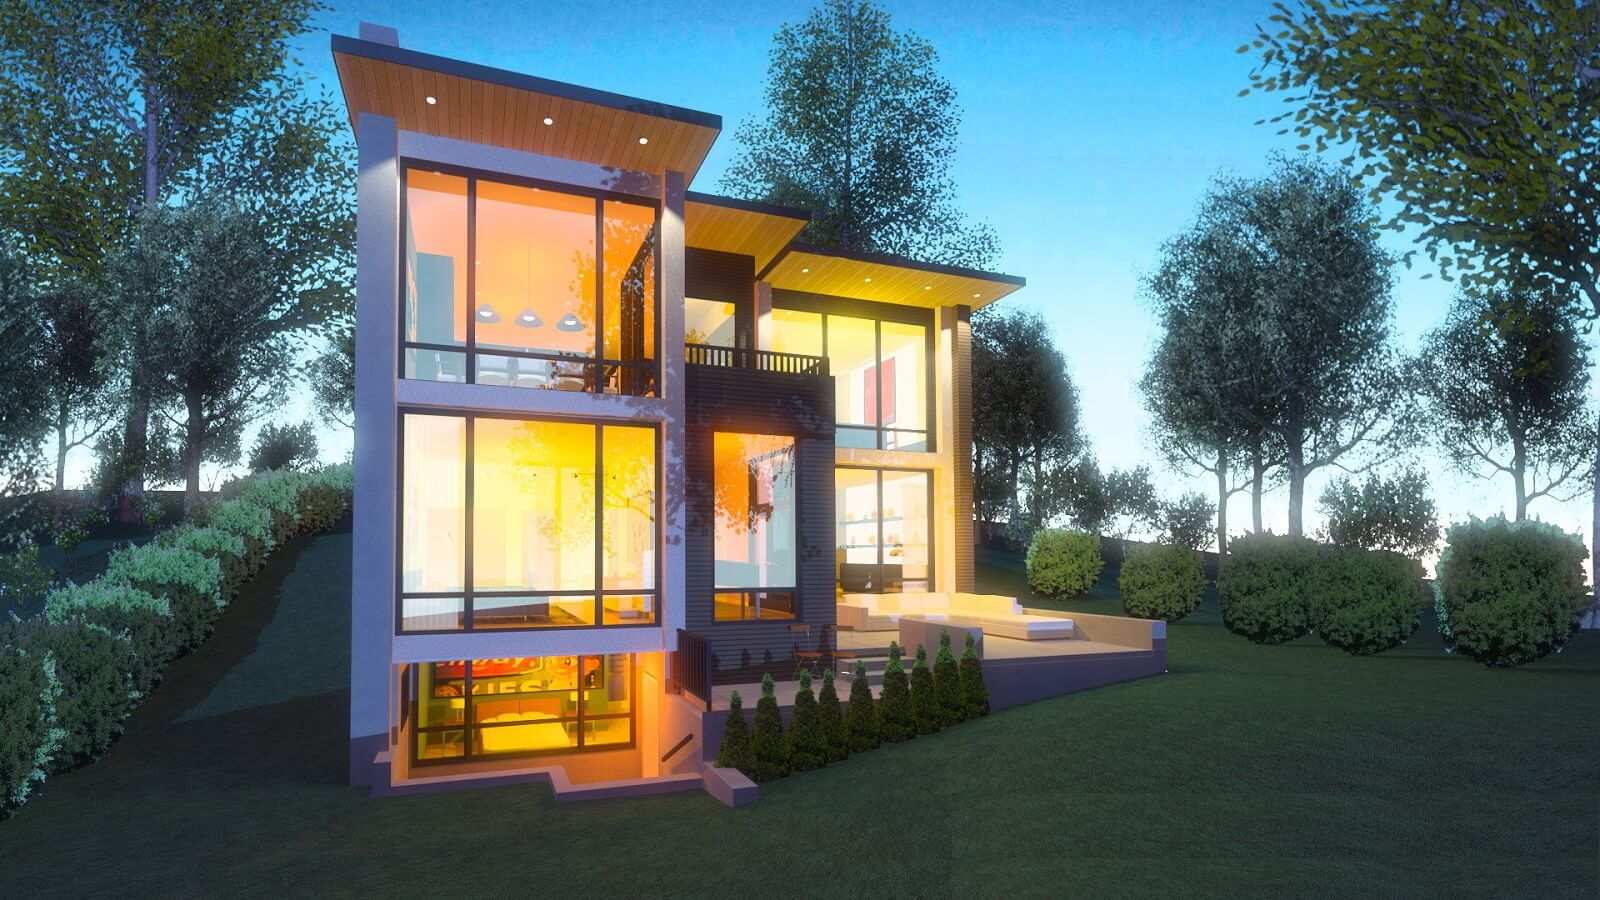 3D Exterior Elevation Design Services